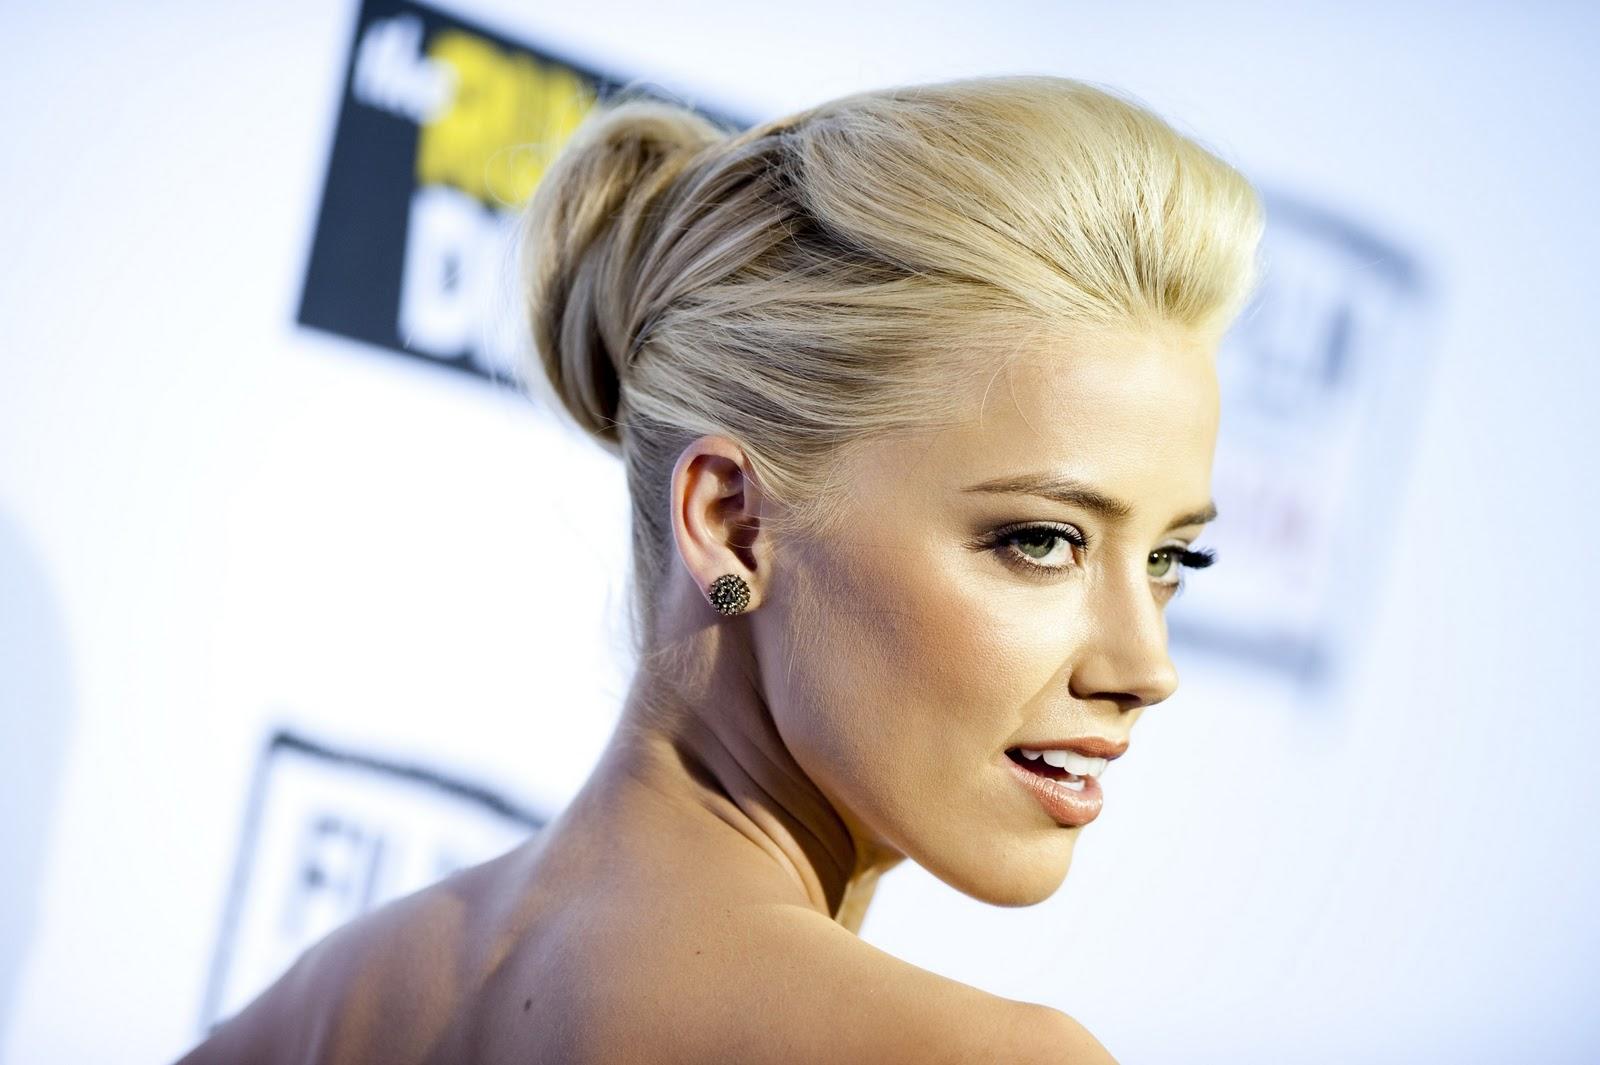 http://1.bp.blogspot.com/-Sd05Z0s_9OM/Tp52dySkTTI/AAAAAAAABiI/I1x1cCd9M7s/s1600/Amber+Heard+as+blonde+bombshell+www.ModaeAmor.com+011.jpg